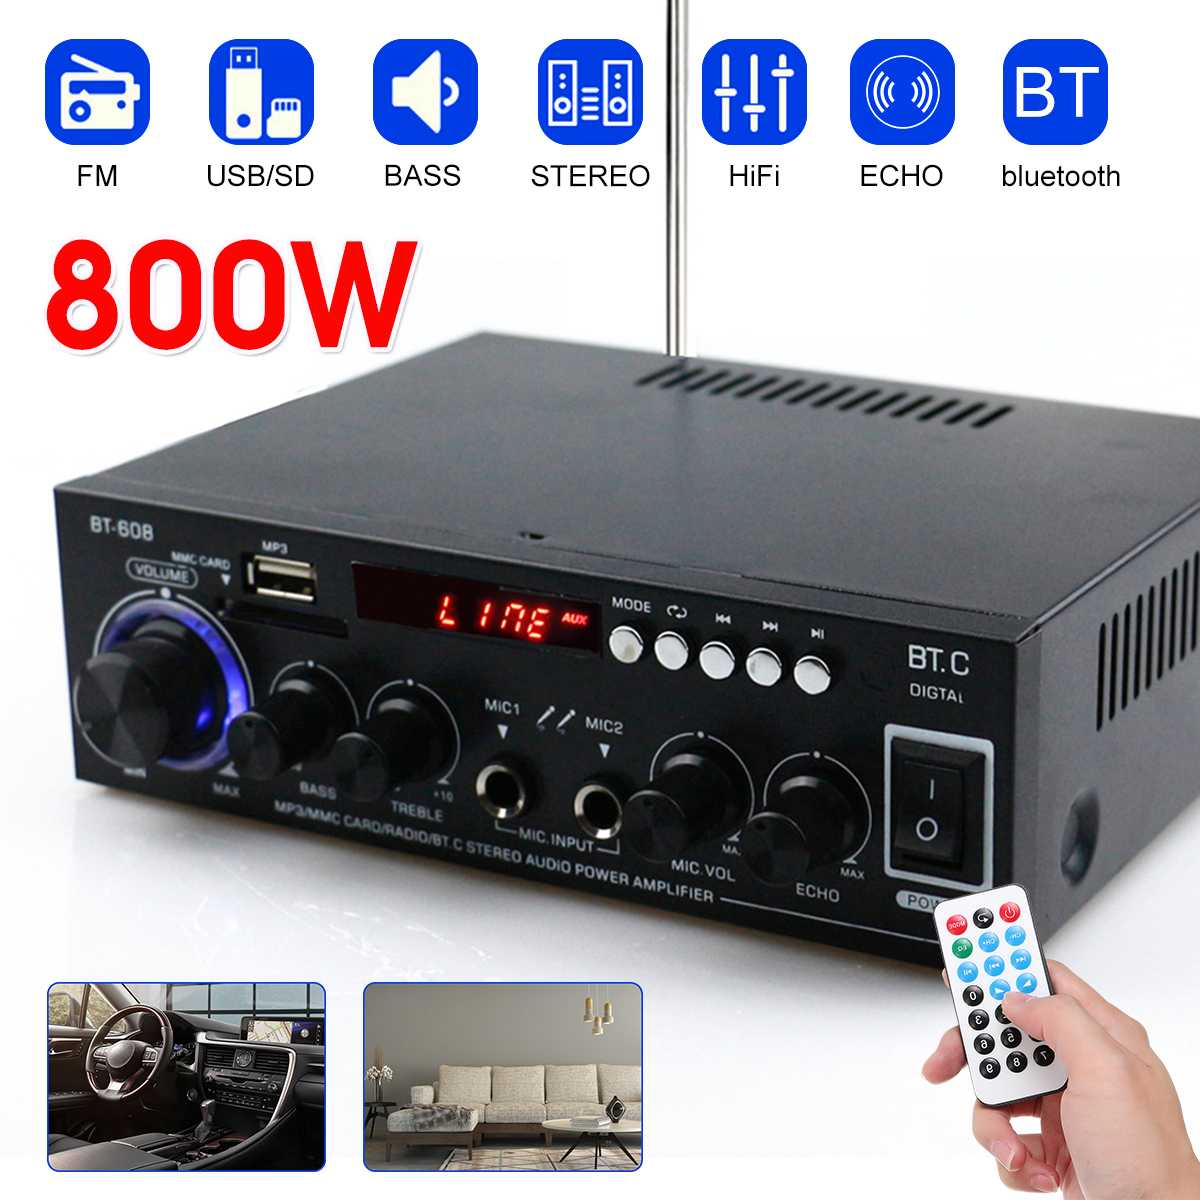 800W HIFI 2CH Audio Power Amplifier 110/220V Home Theater Sound System Audio Mini Amplifier FM USB SD bluetooth W/Remote Control